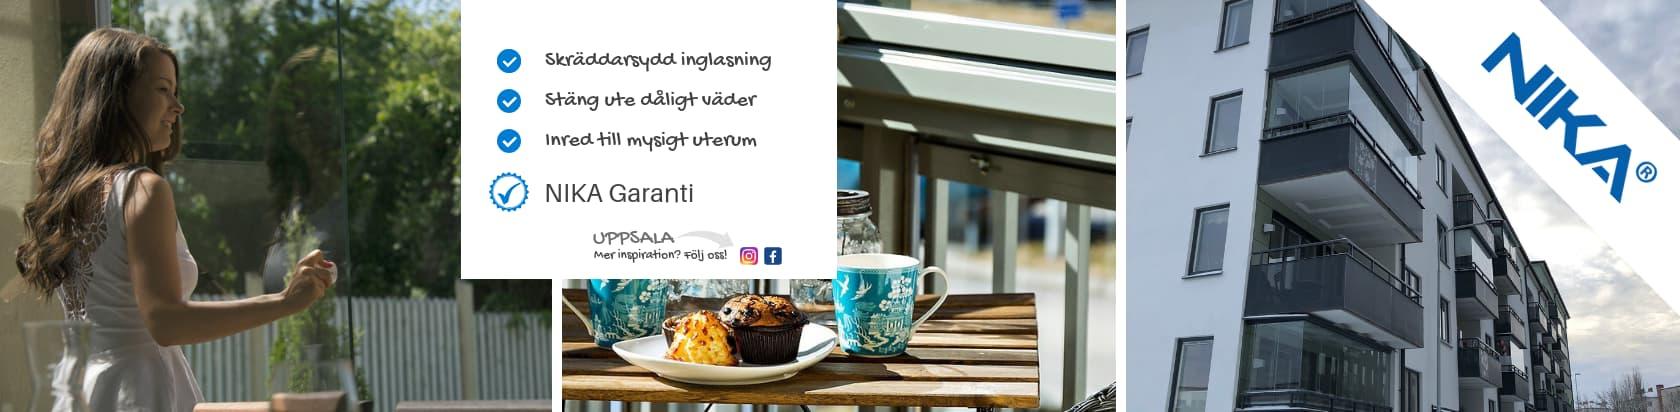 Uppsala balkonginglasningar - Skräddarsydda glaspartier Uppsala - NIKA Inglasning AB